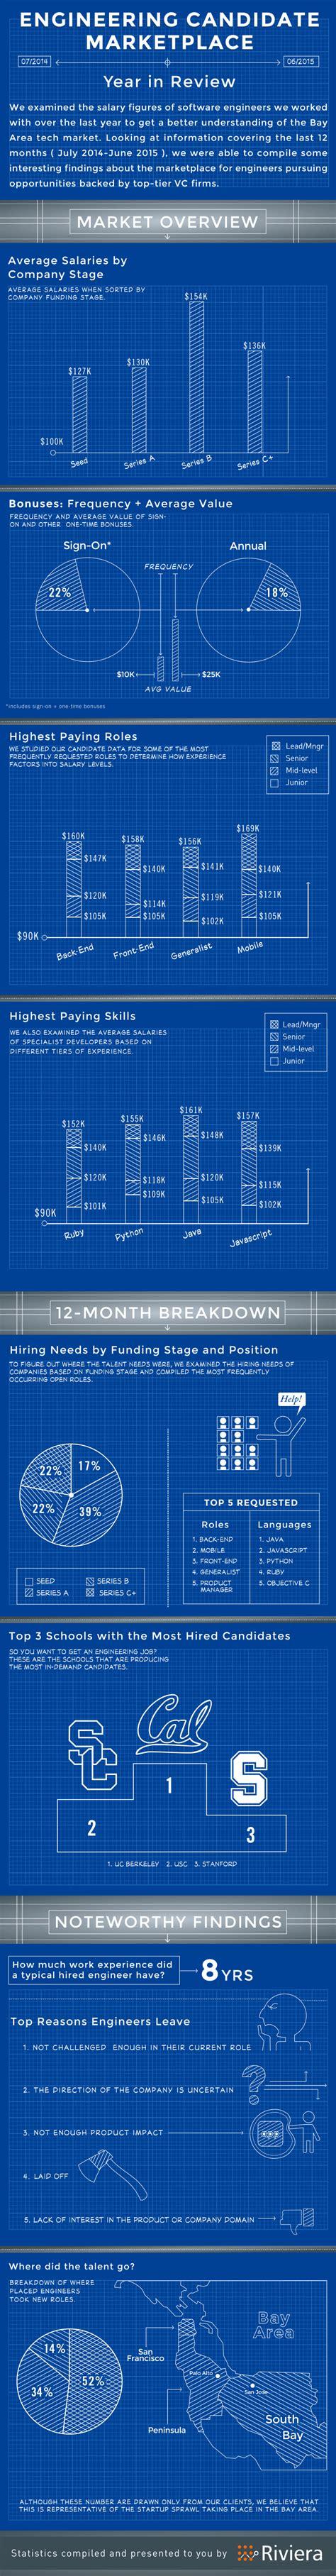 best software engineer salaries of software engineers top paying skills top